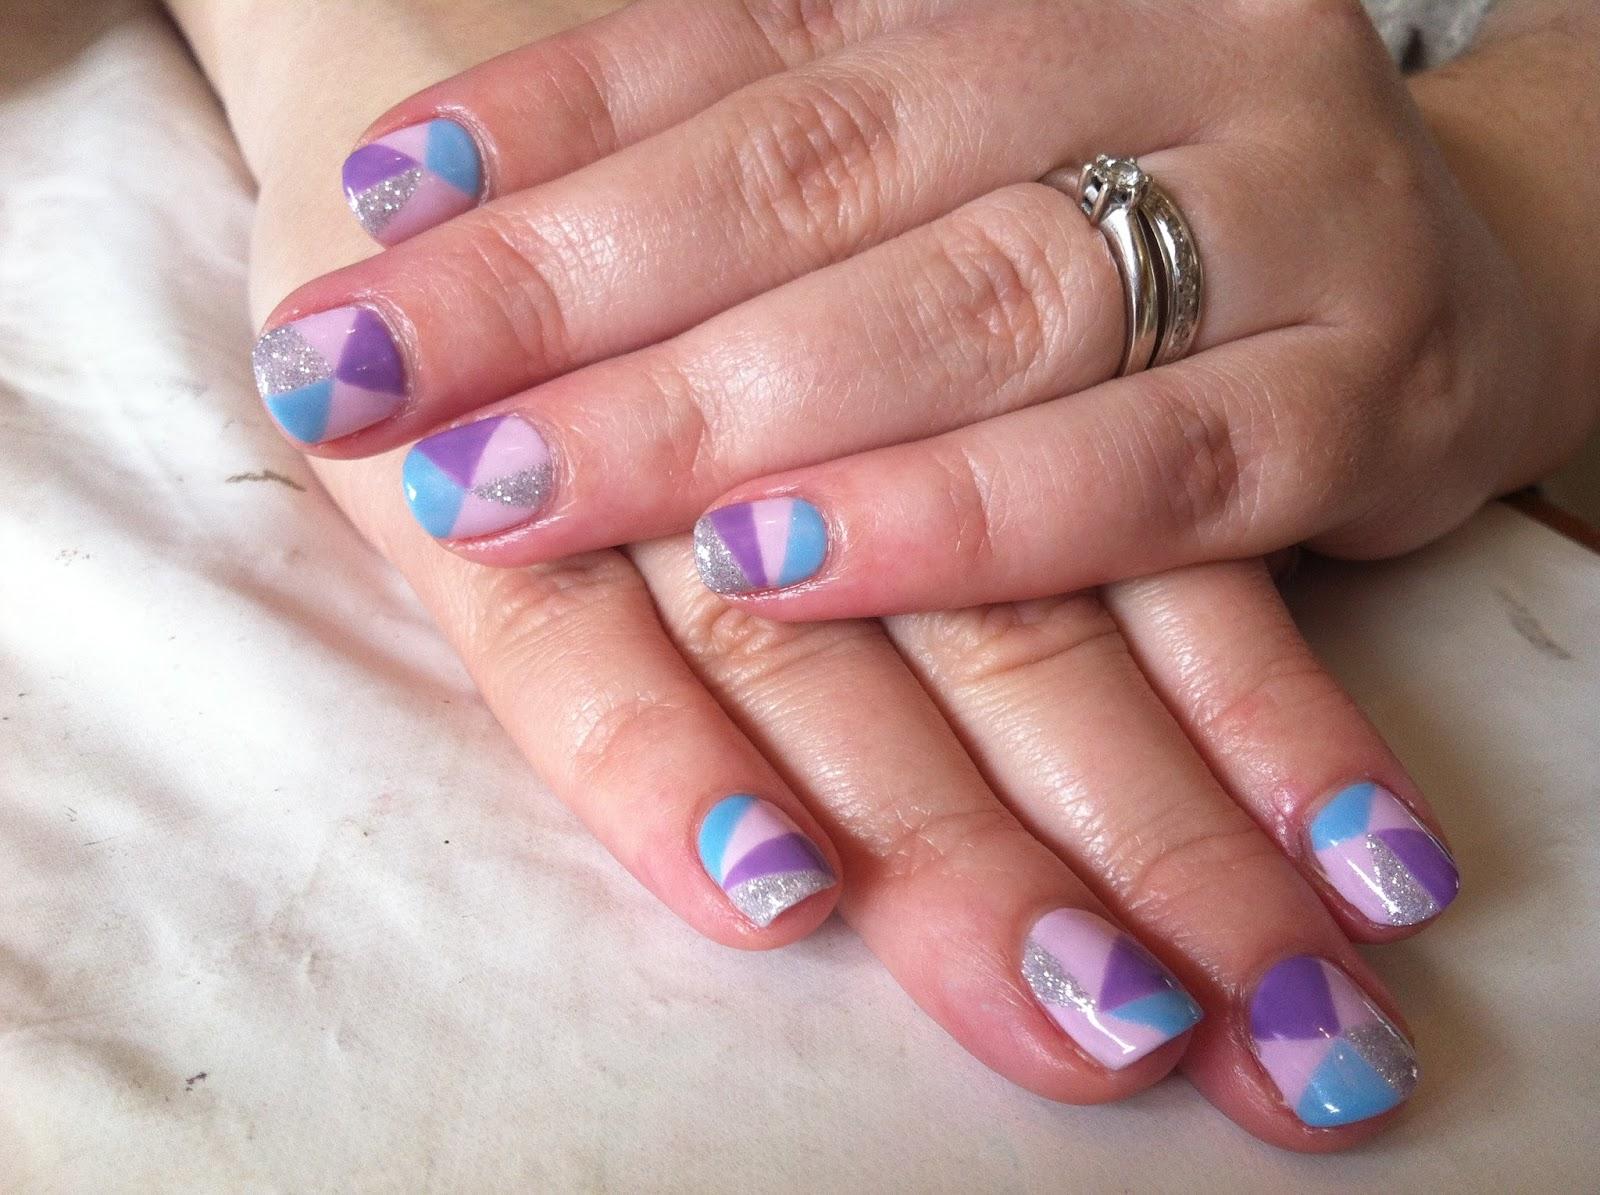 CND Shellac Nail Art - Freehand Geometric